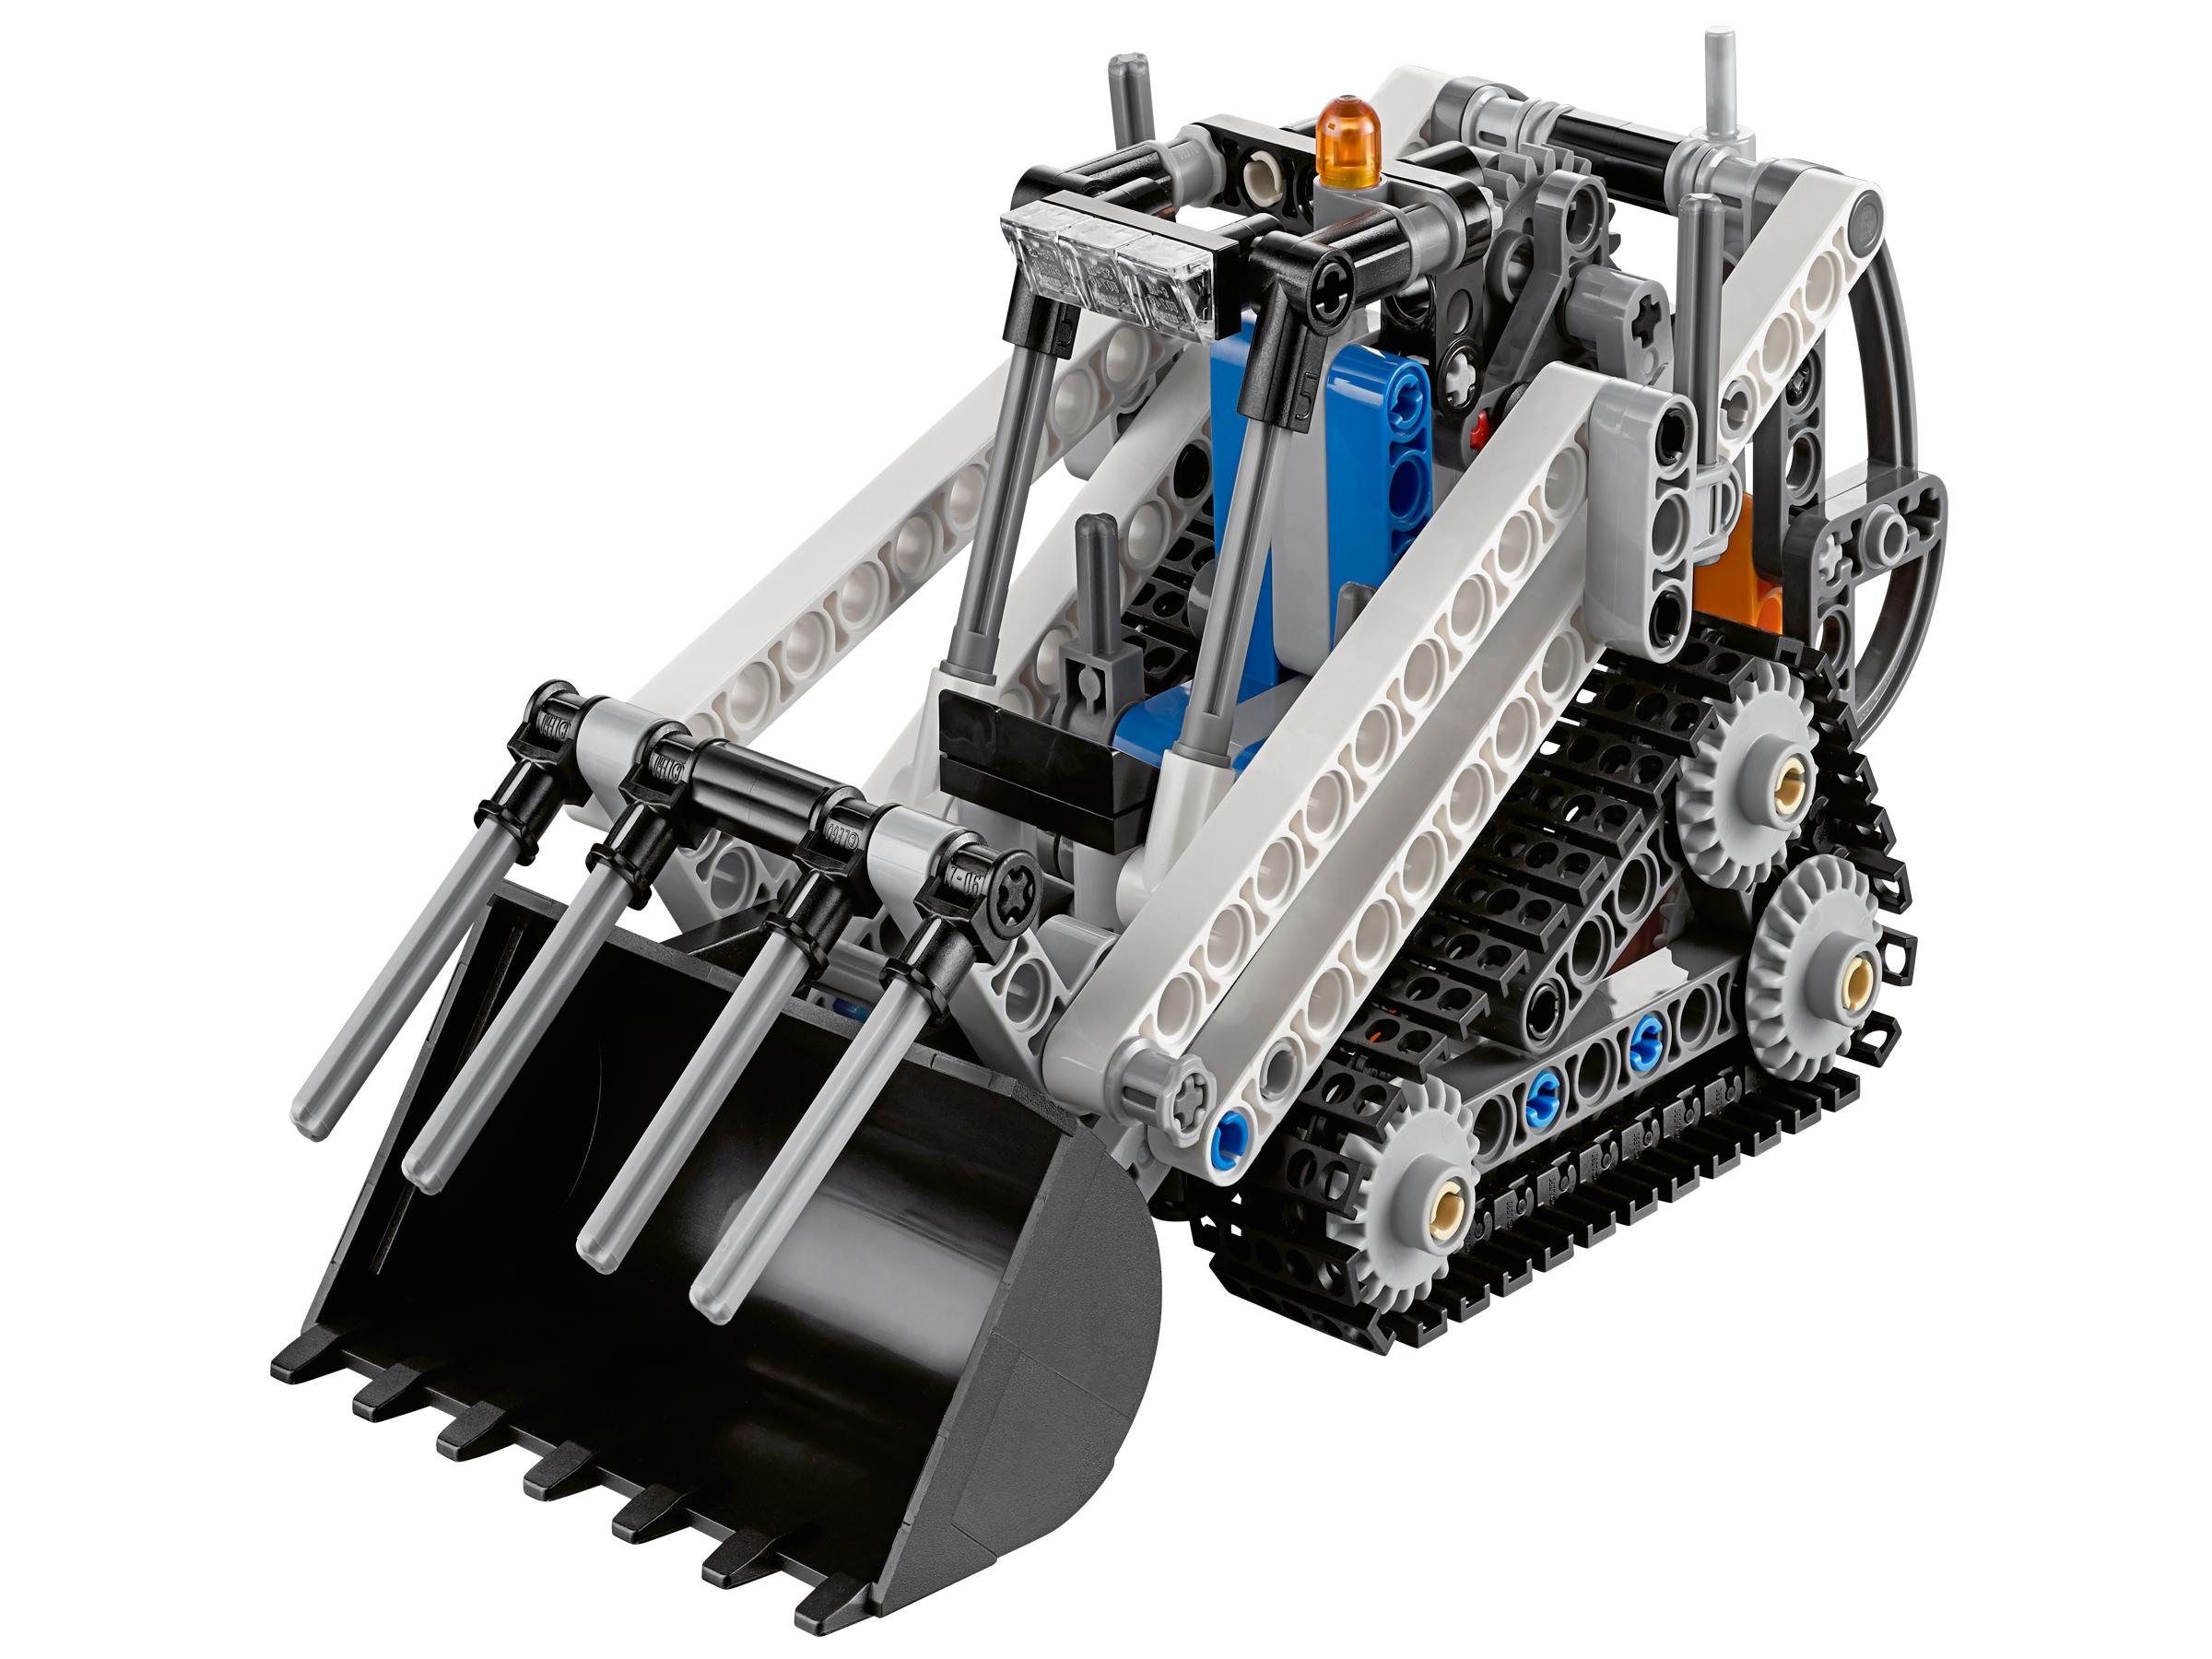 lego rupsband graafmachine 42032